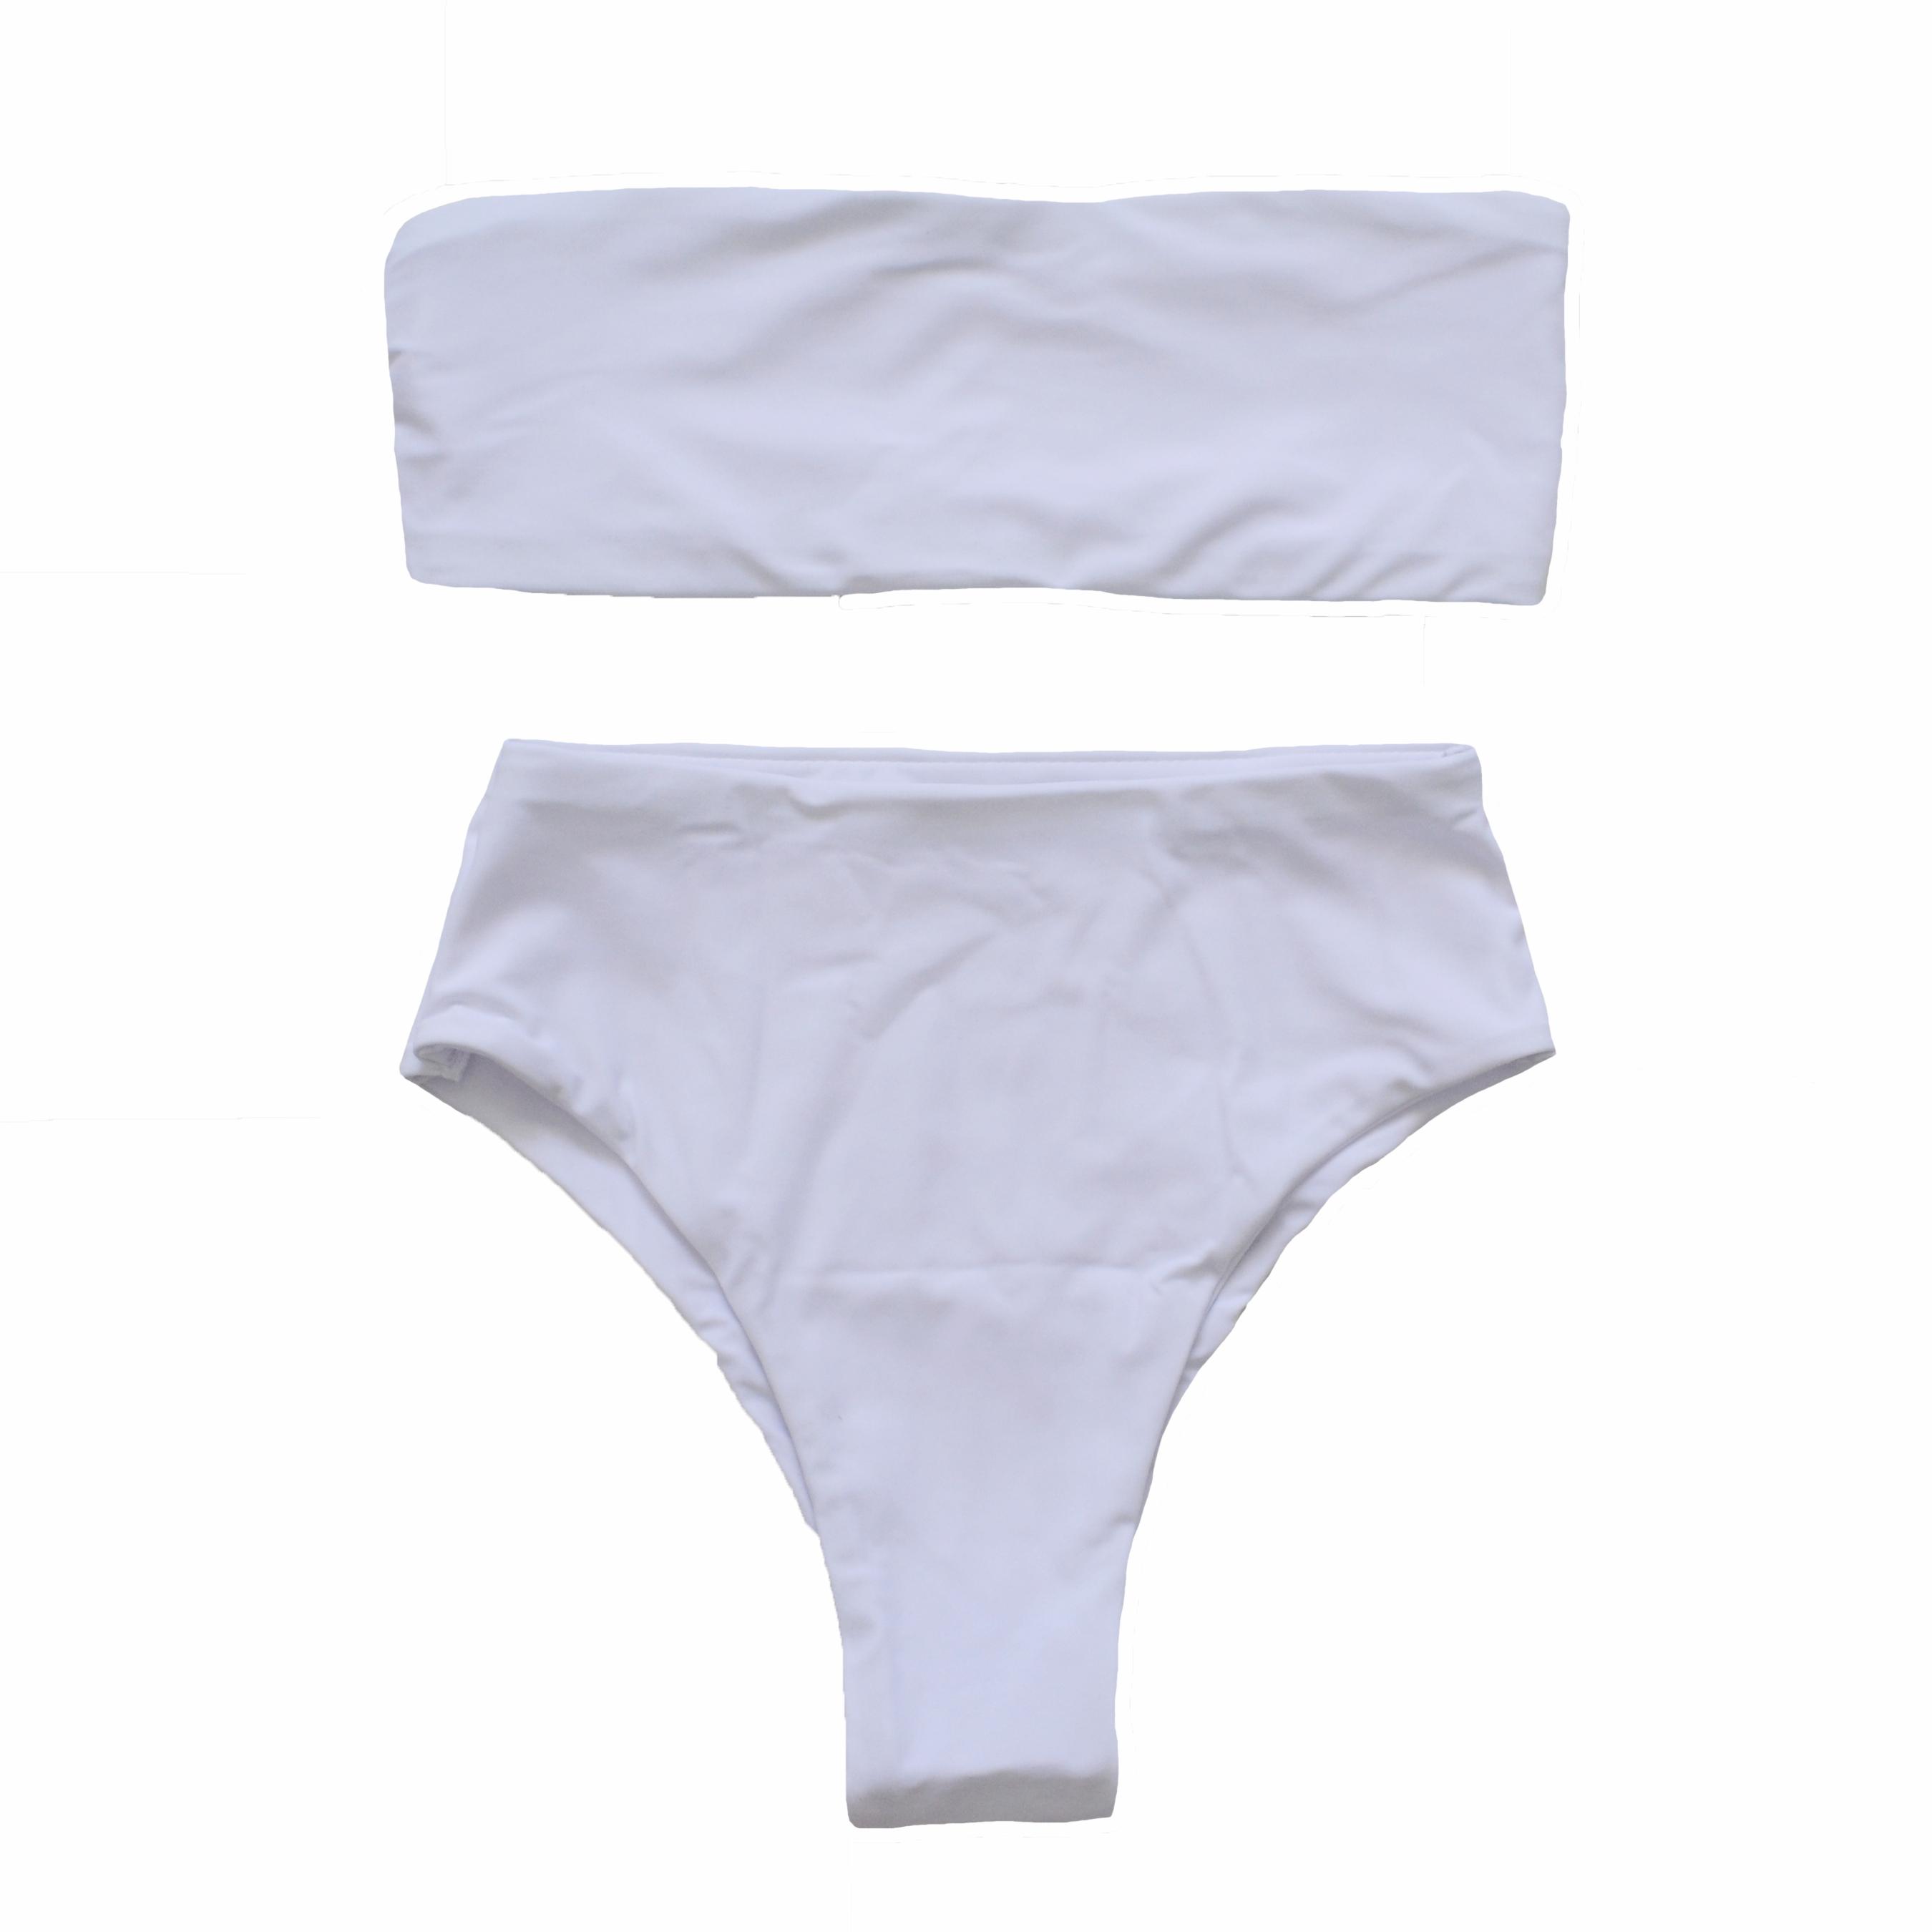 c5544af7ad Venus Bikini Set in White on Storenvy